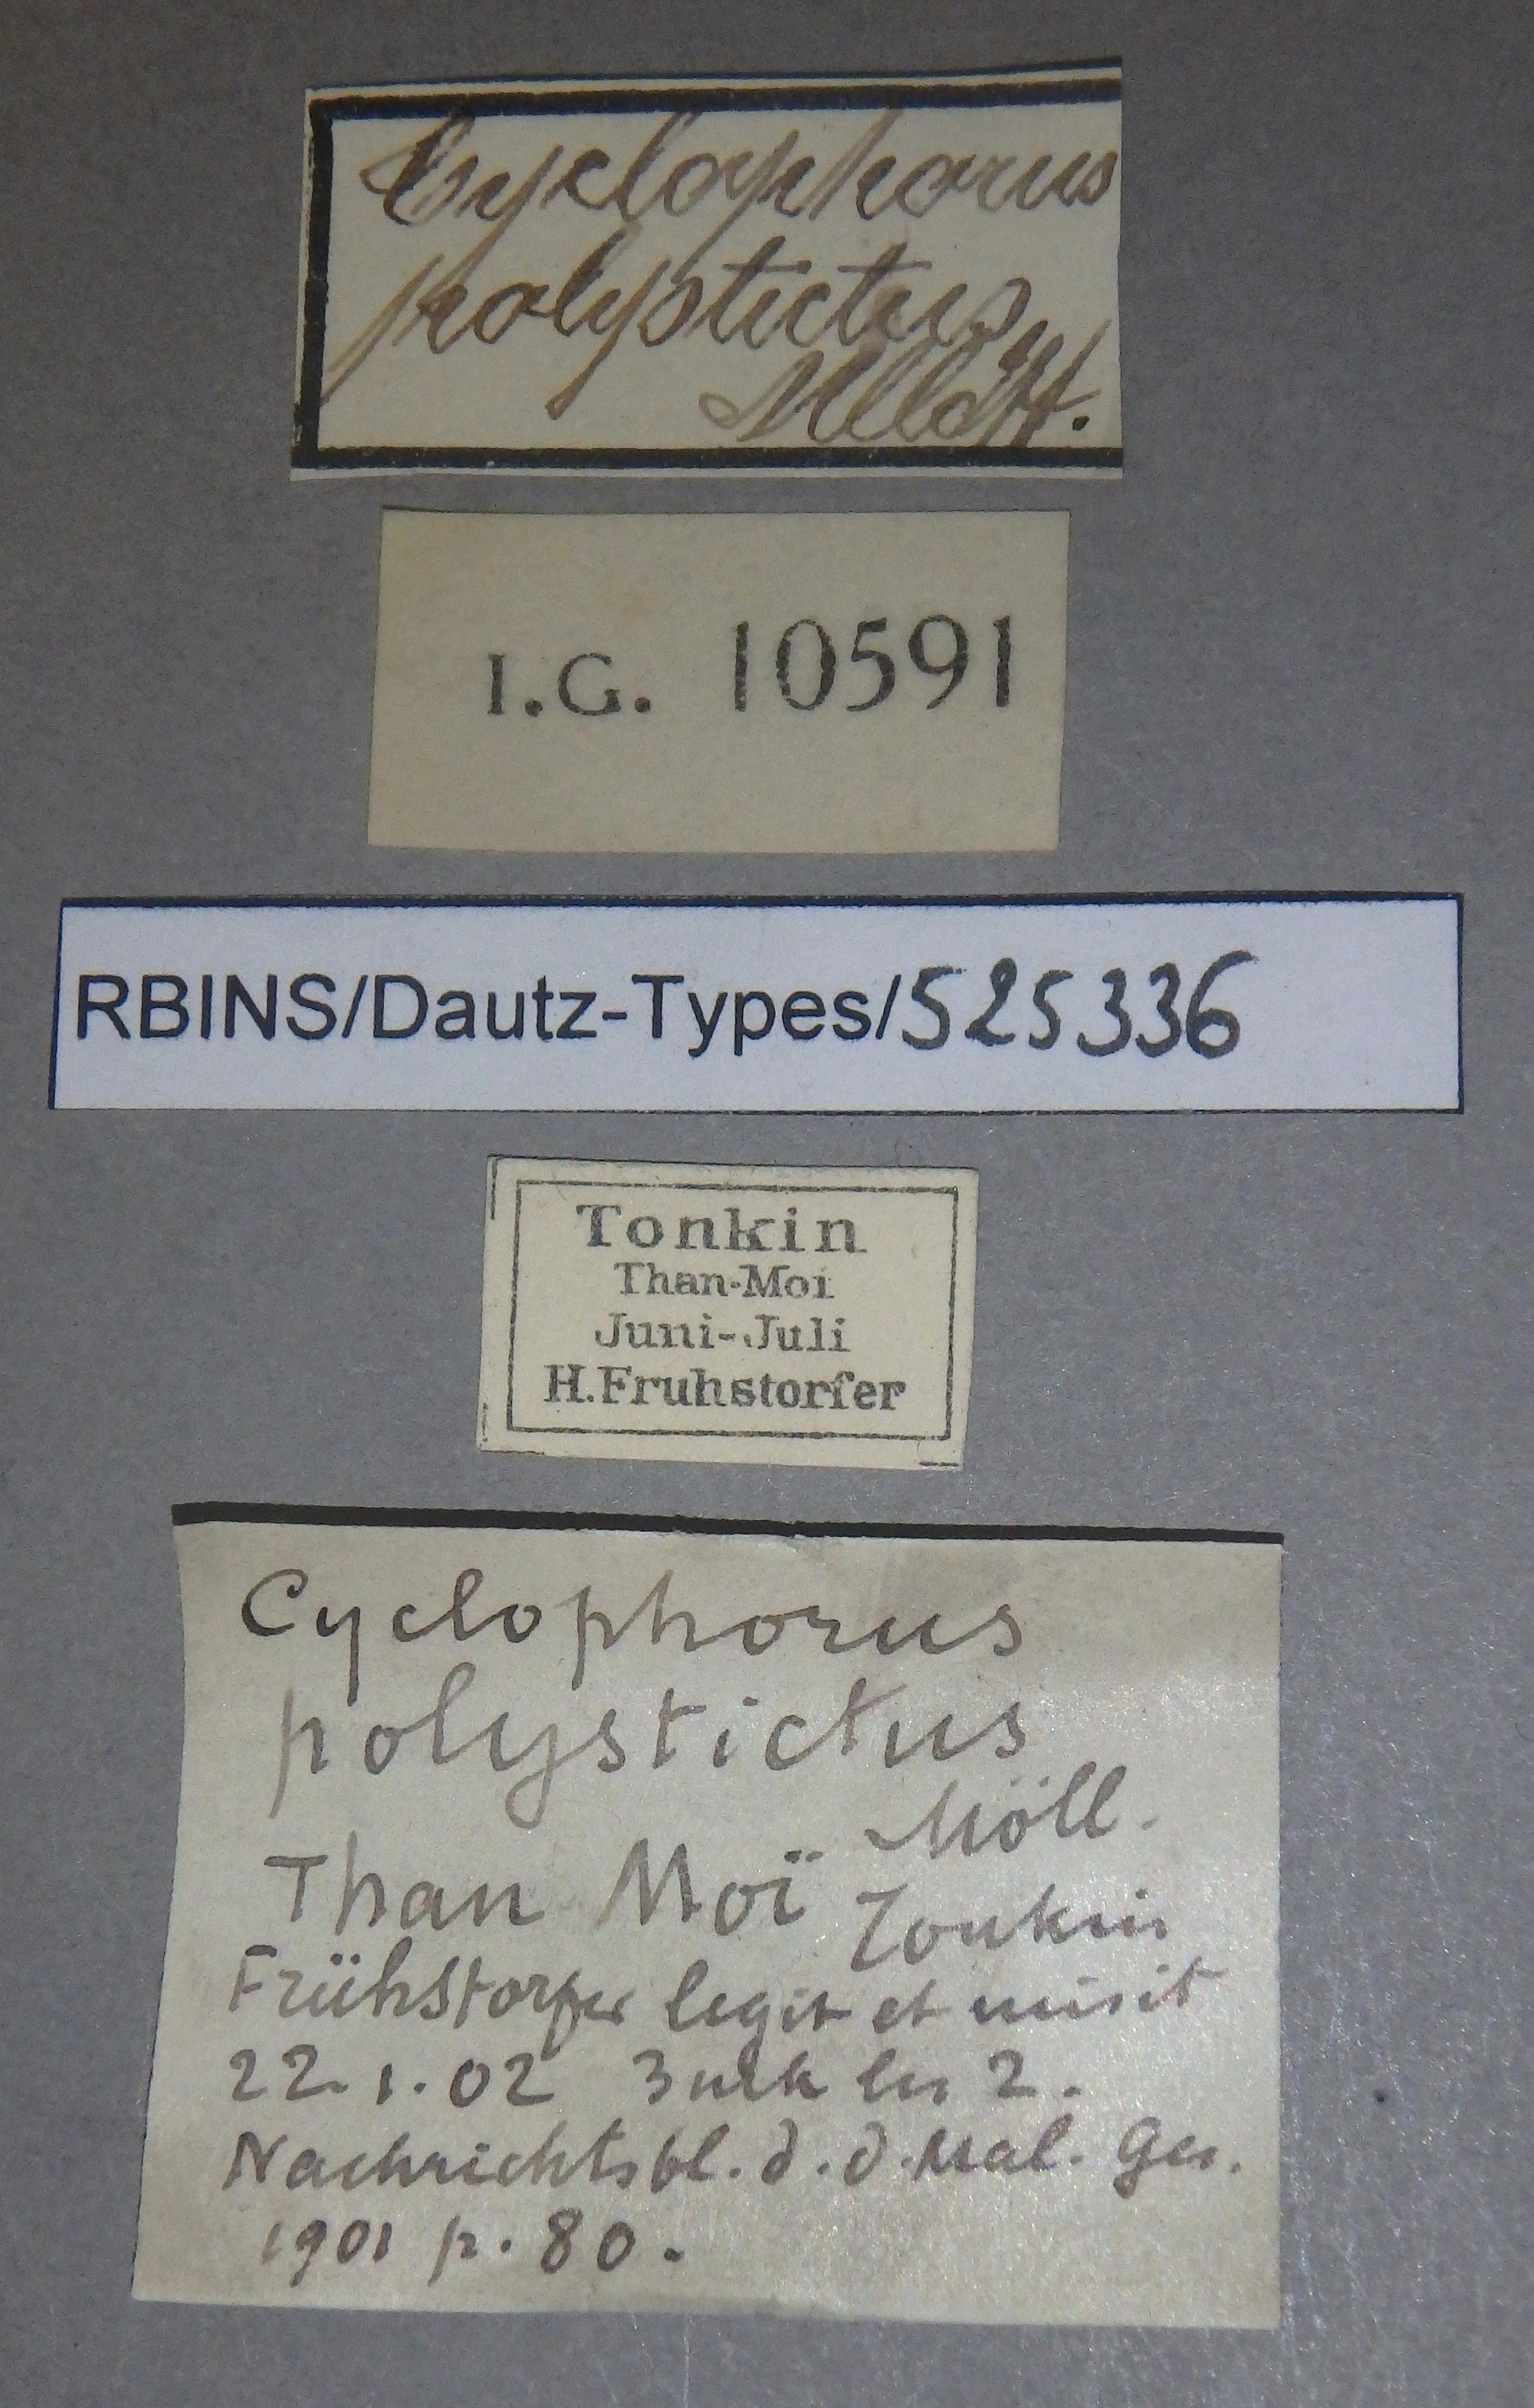 BE-RBINS-INV MT 915/2 Cyclophorus (Eucyclophorus) polystictus pt Lb.jpg